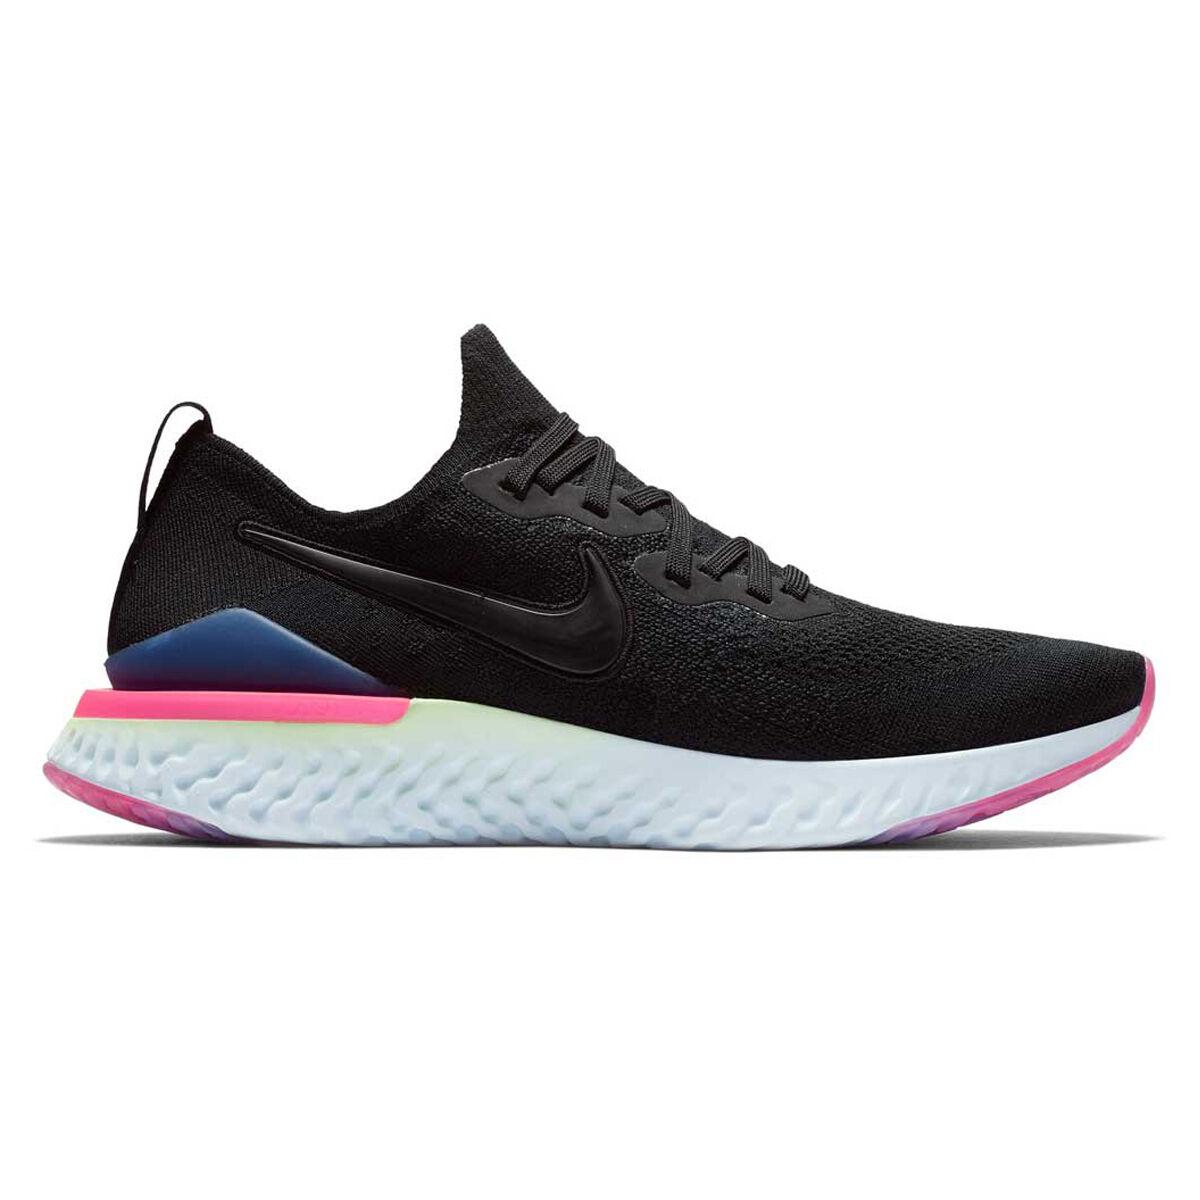 Nike epic react flyknit 2 men's sneakers NWT